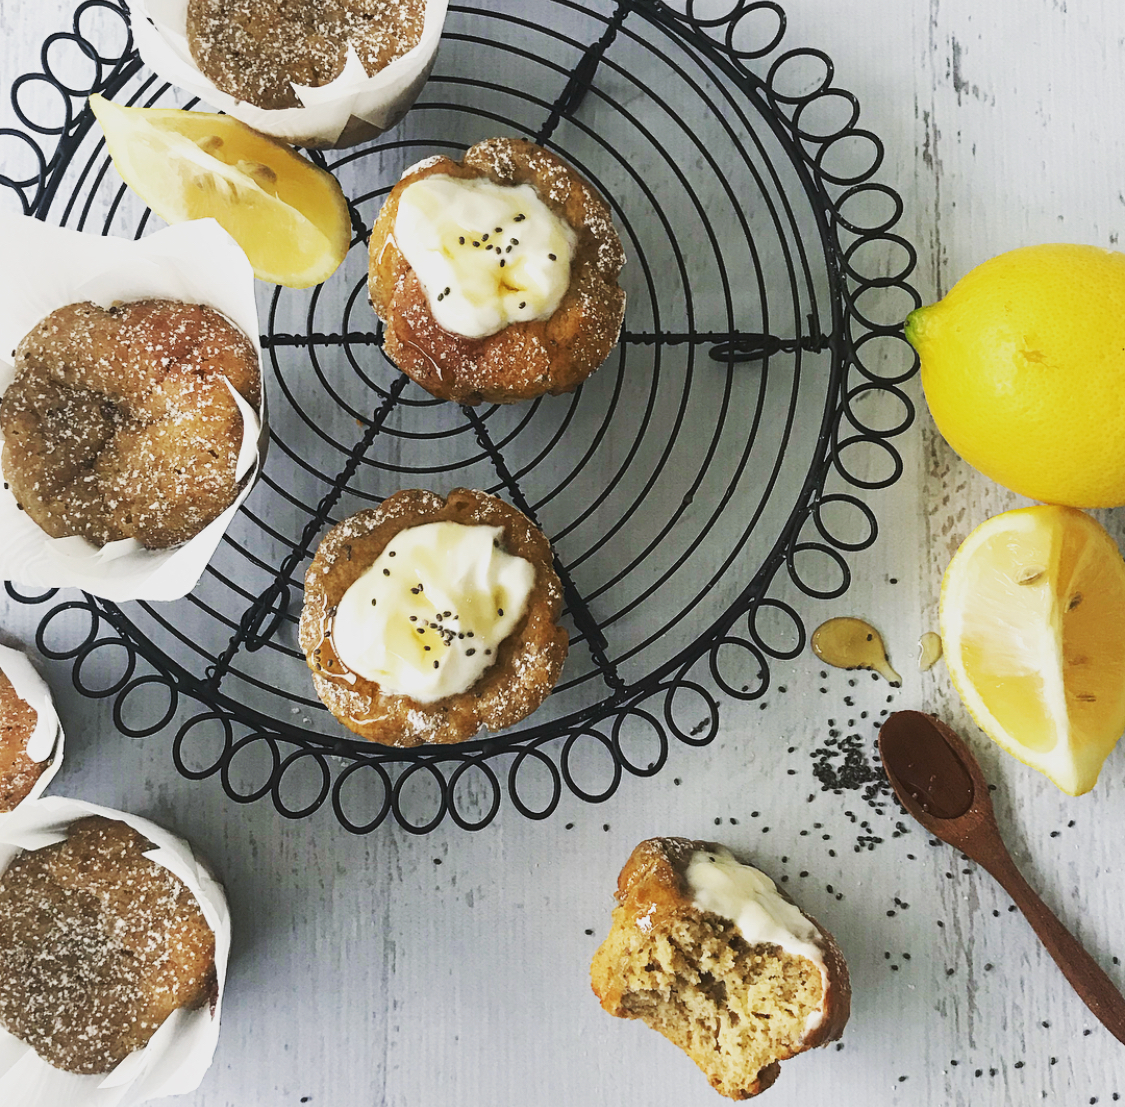 Sugar Free Lemon, Chia, Honey Cakes by Gourmet Casa Kitchen